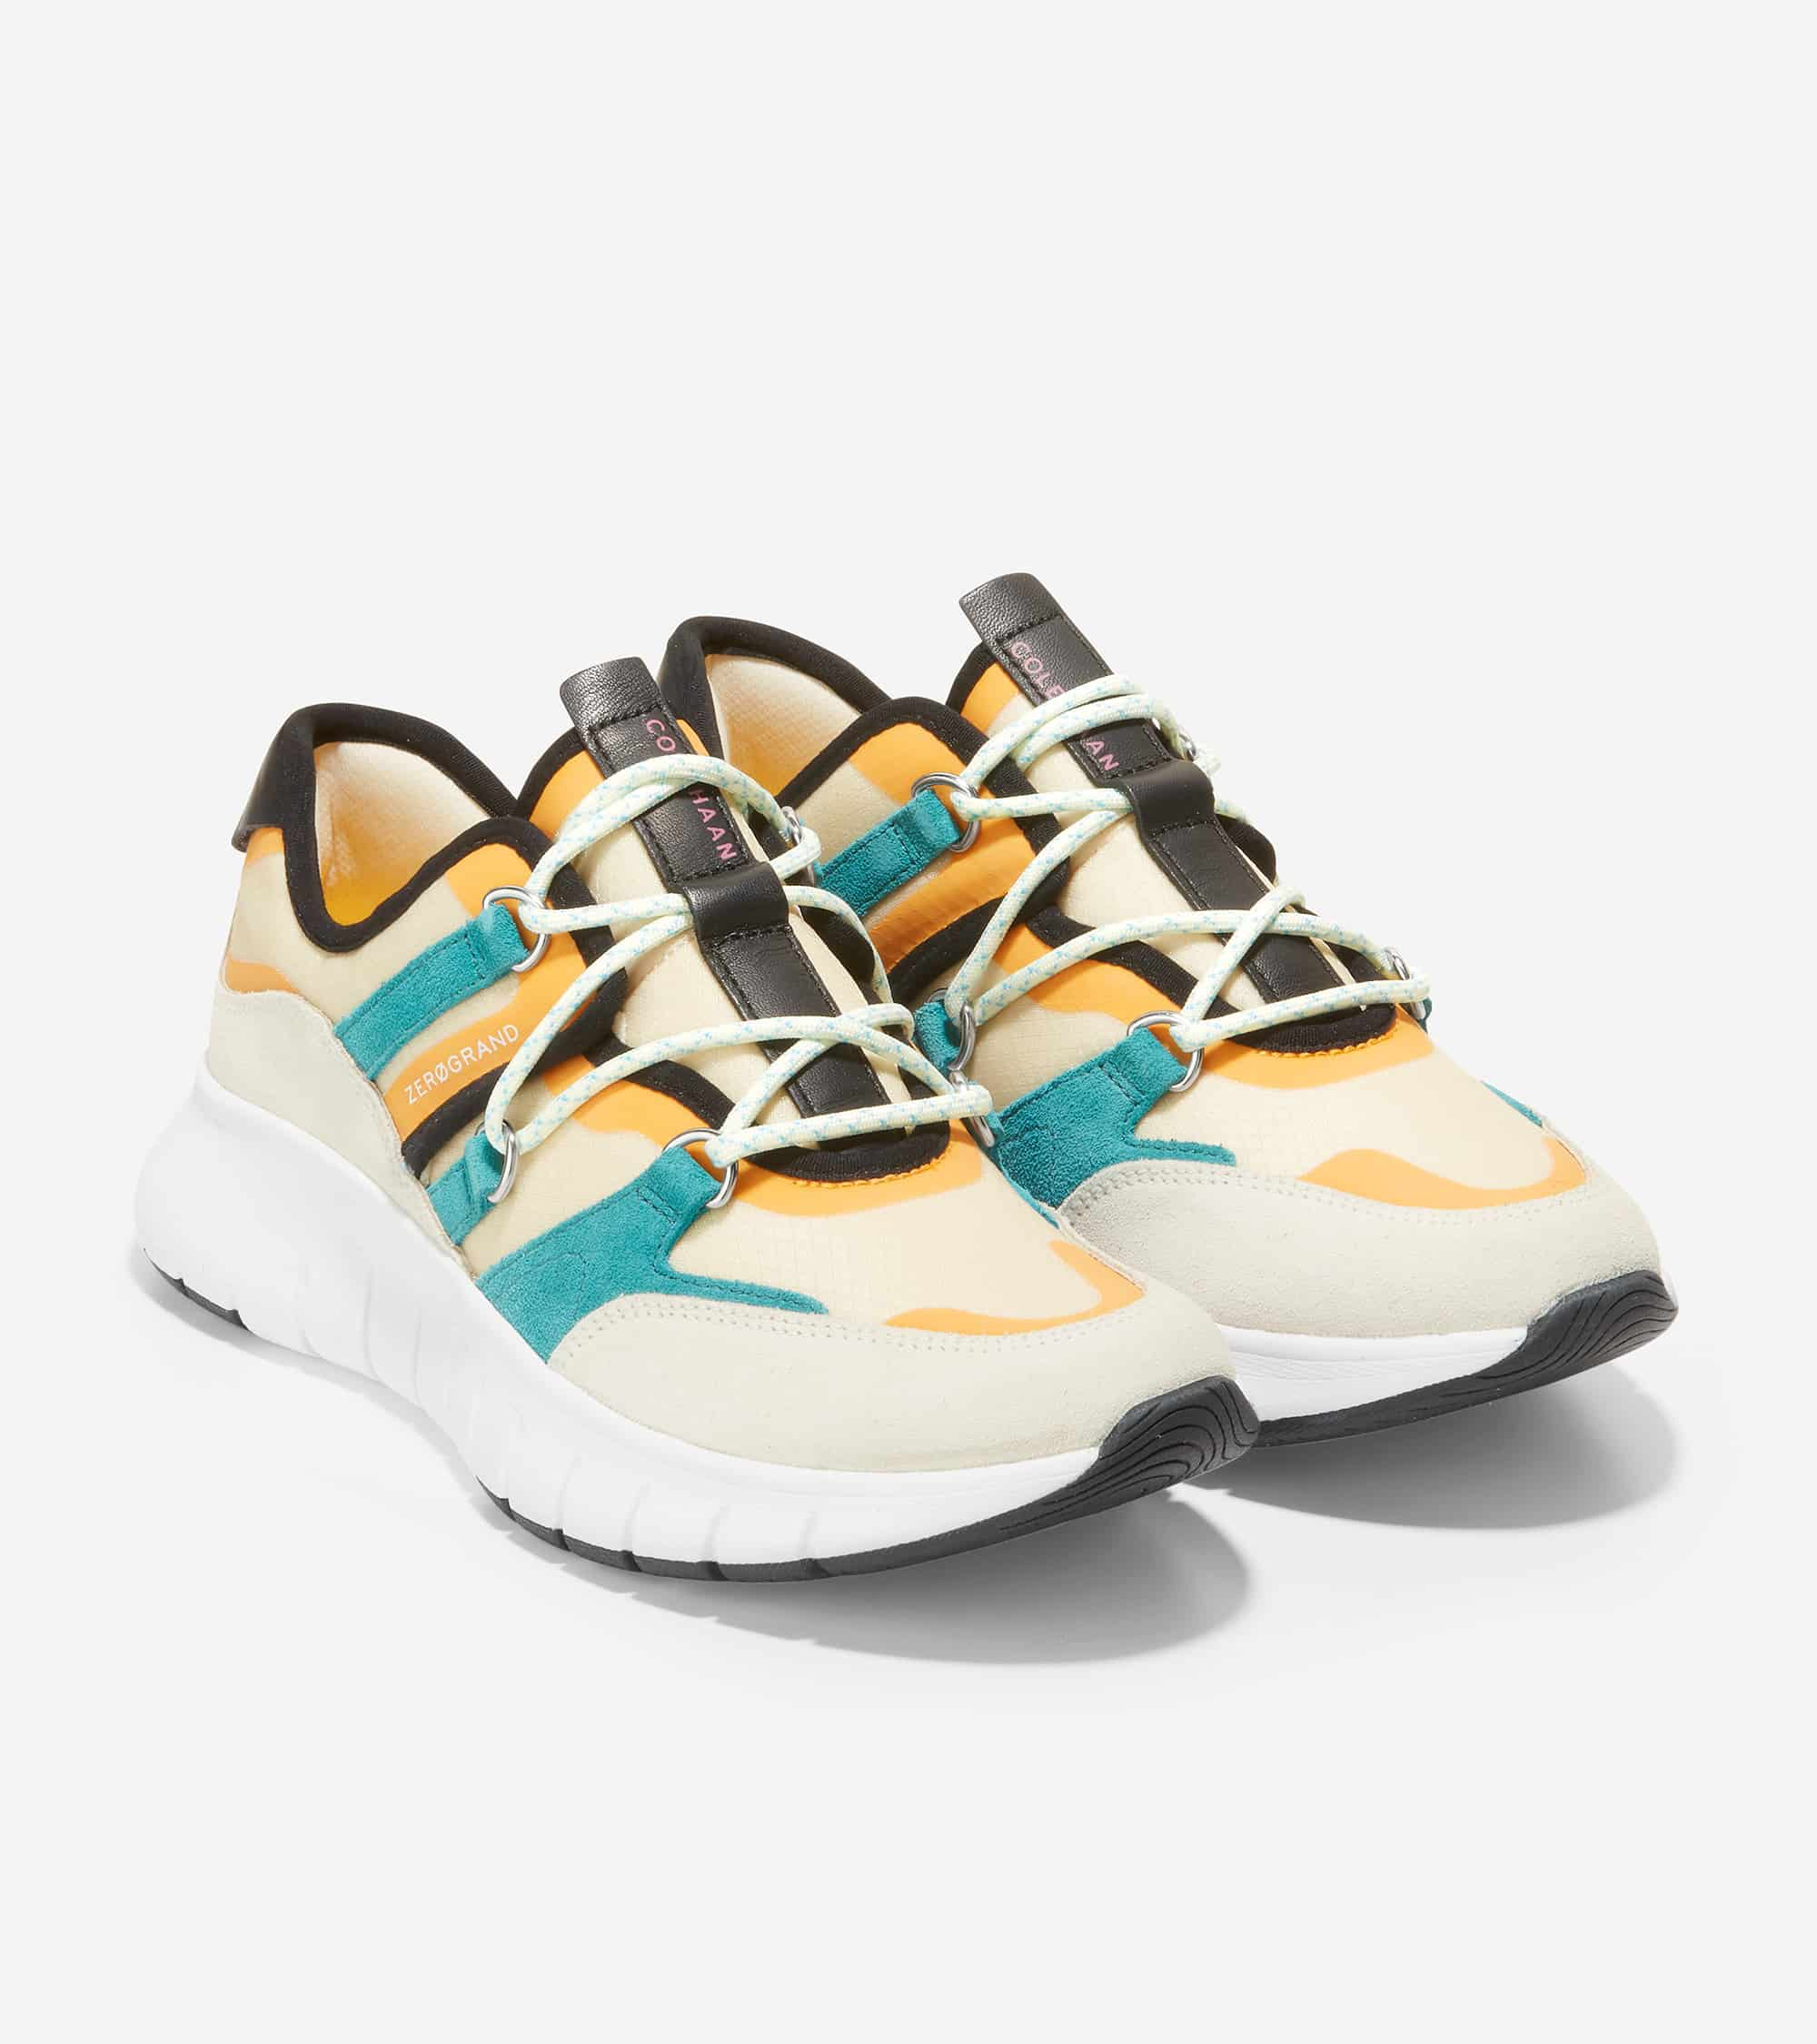 Cole Haan ZERØGRAND Flex Lace Up Sneaker Whitecap Grey Suede/ Deep Lake/ Cement Mesh/ Golden Rod / Ivory